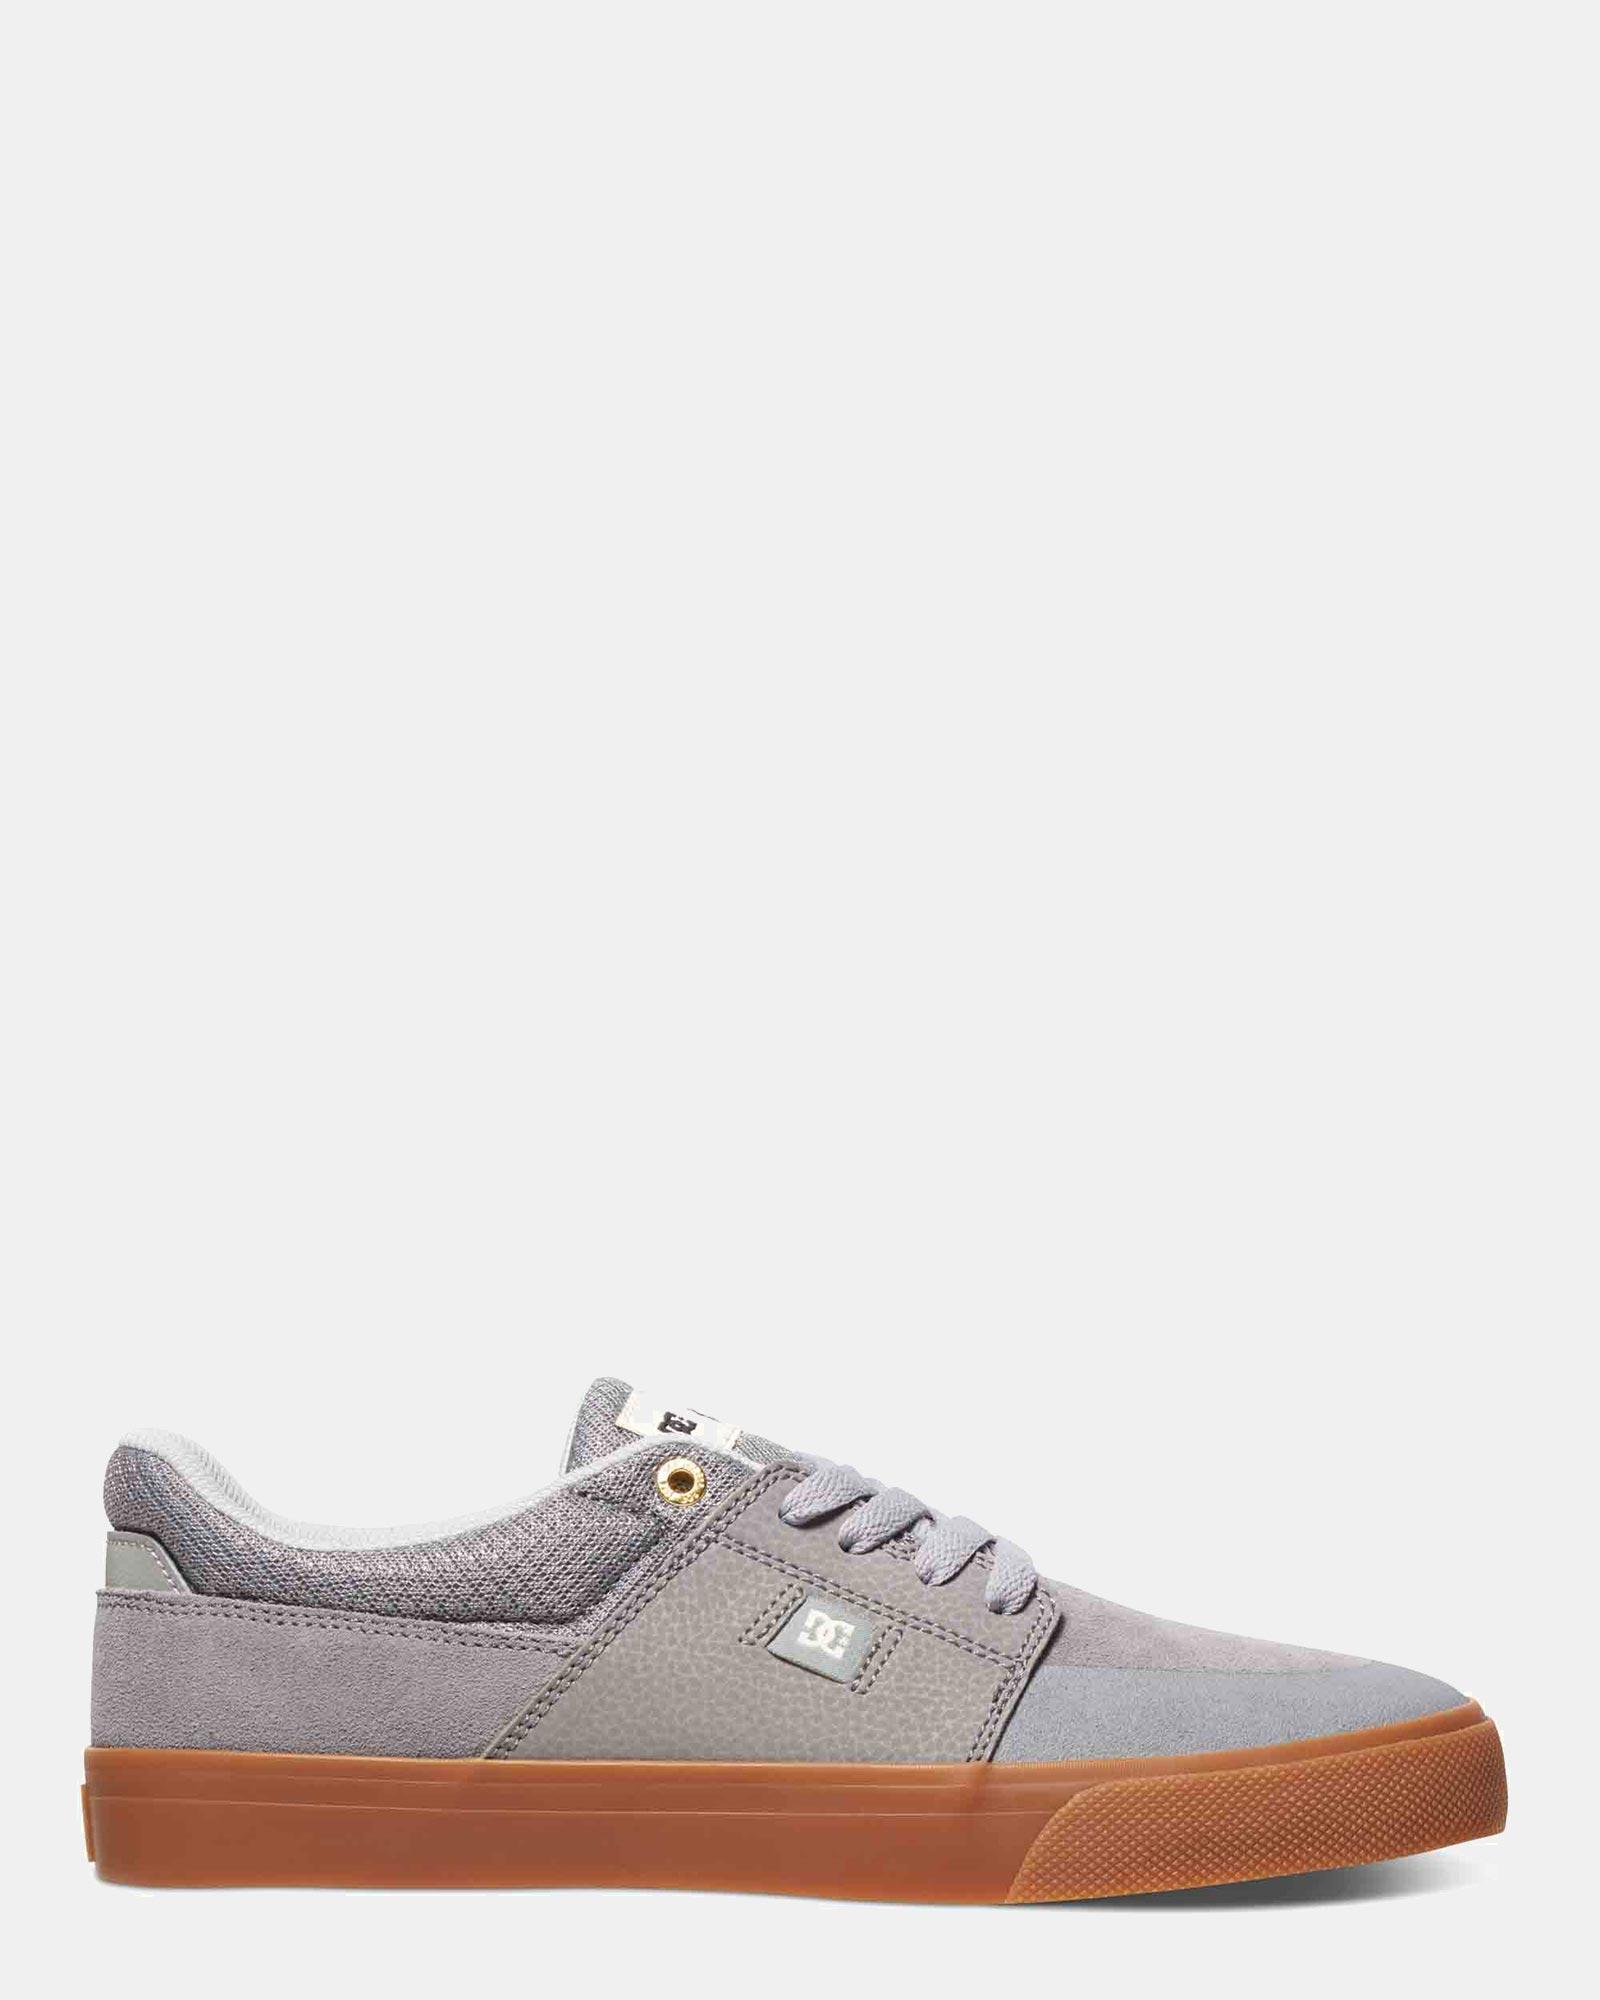 DC Mens Wes Kremer Shoe Grey Gum